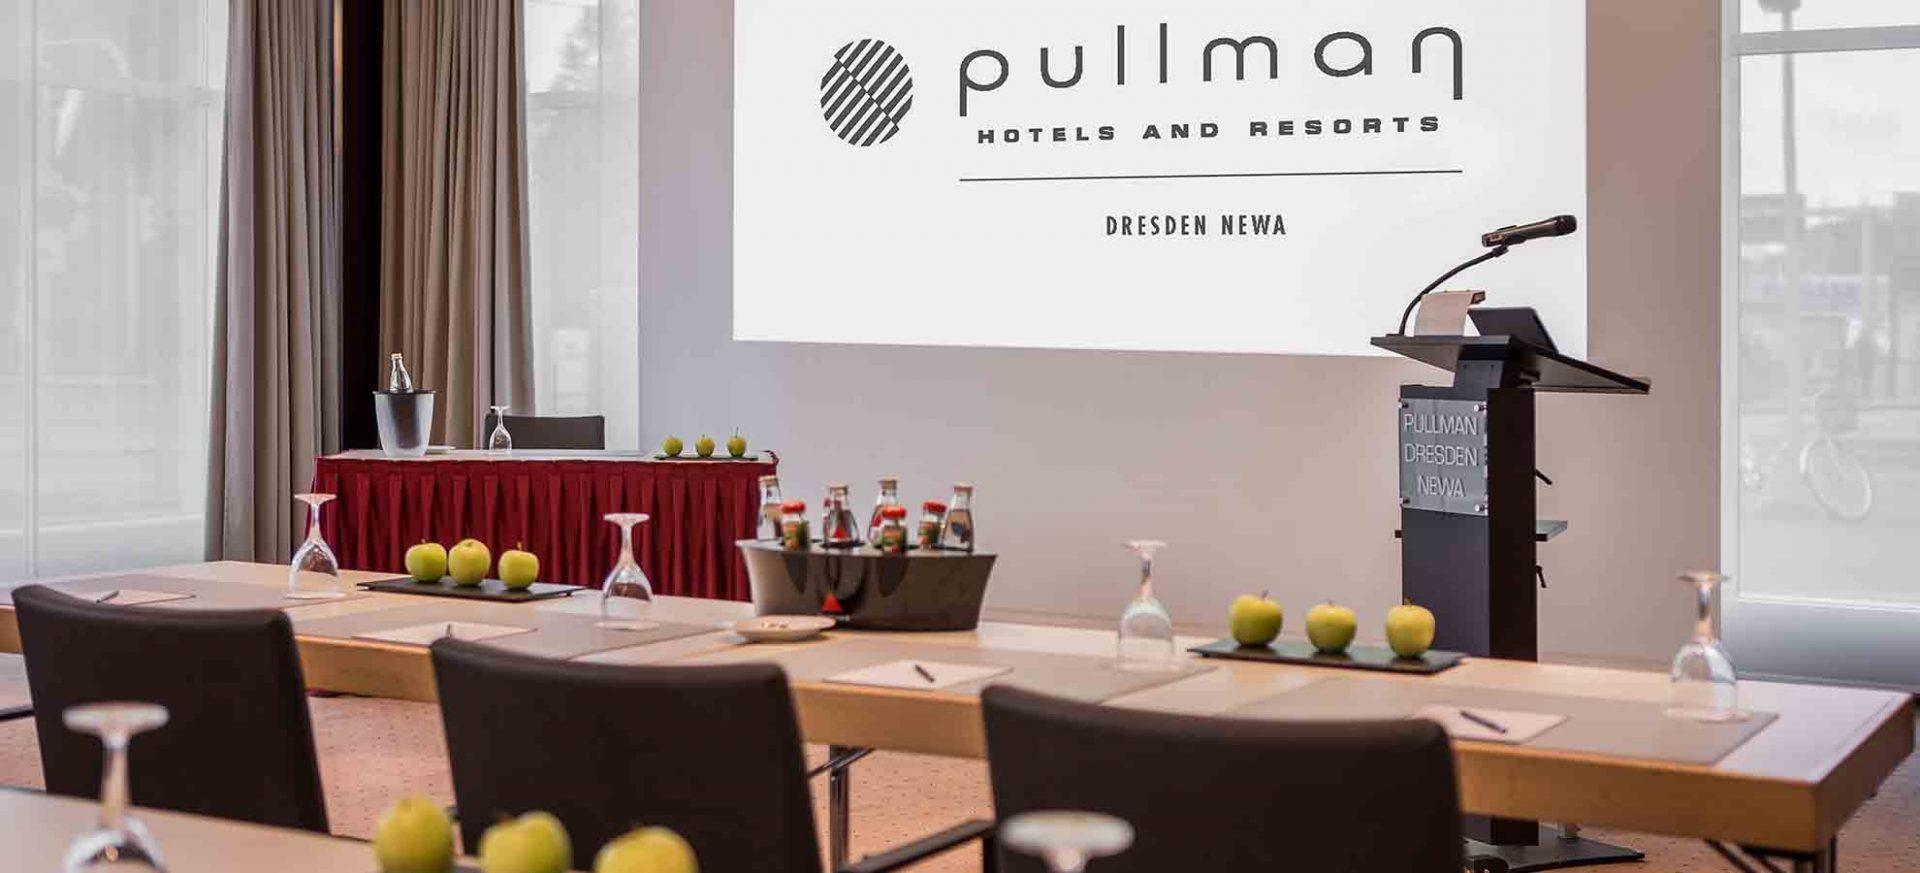 Galerie pullman hotel dresden newa for Pullman dresden newa